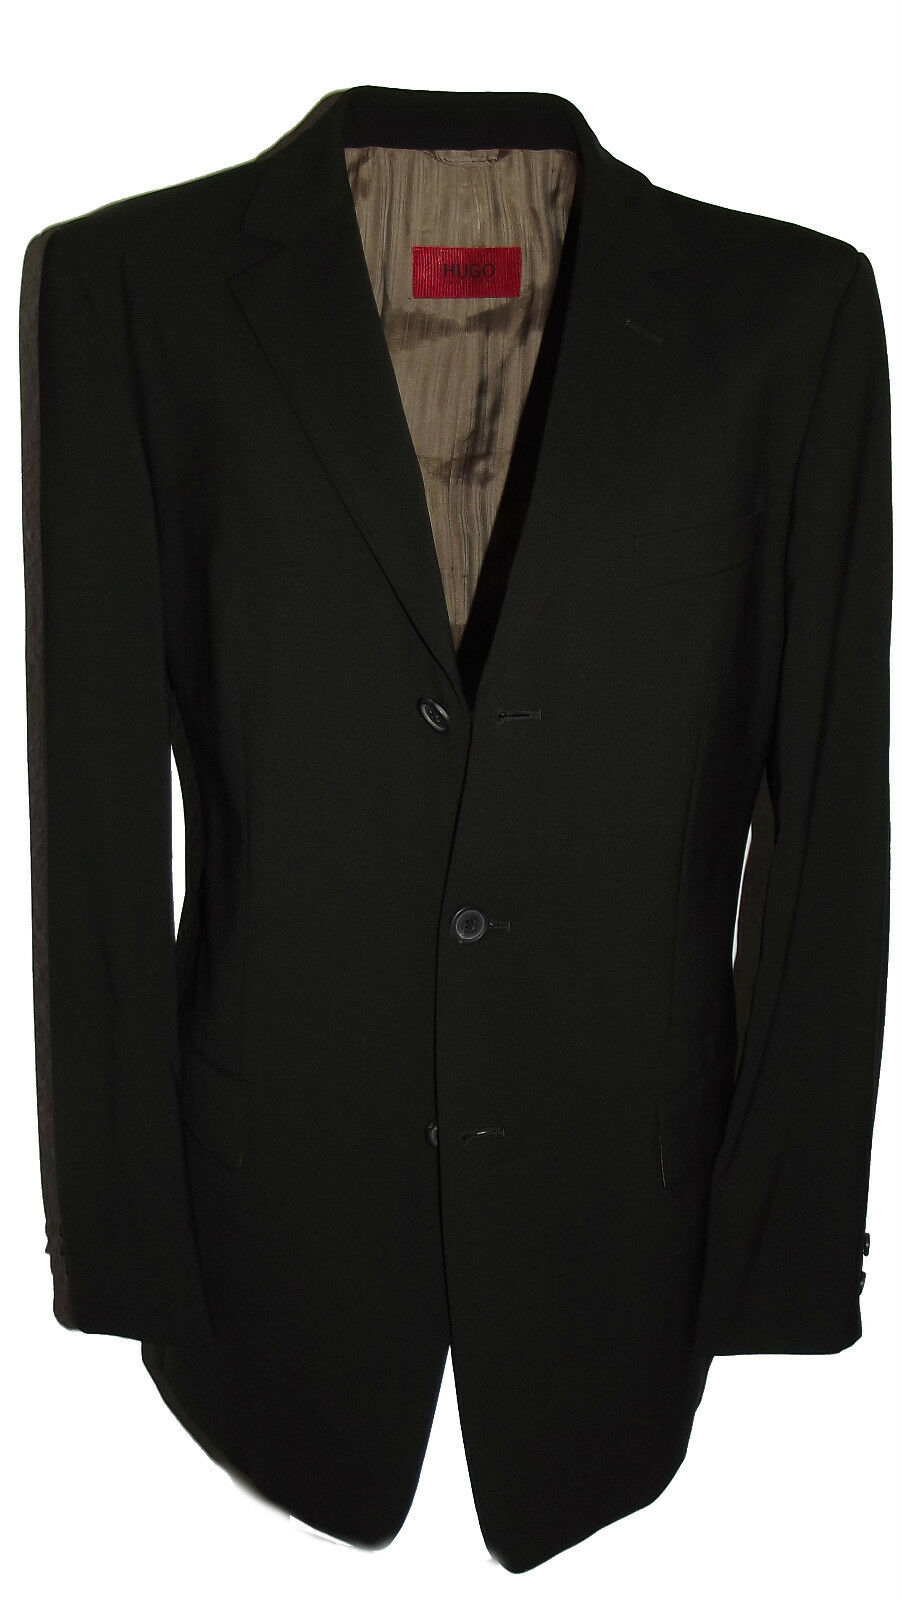 HUGO BOSS Luxus Anzug Gr. 50 Albo Hago Dunkelbrown Regular-Fit brown NP